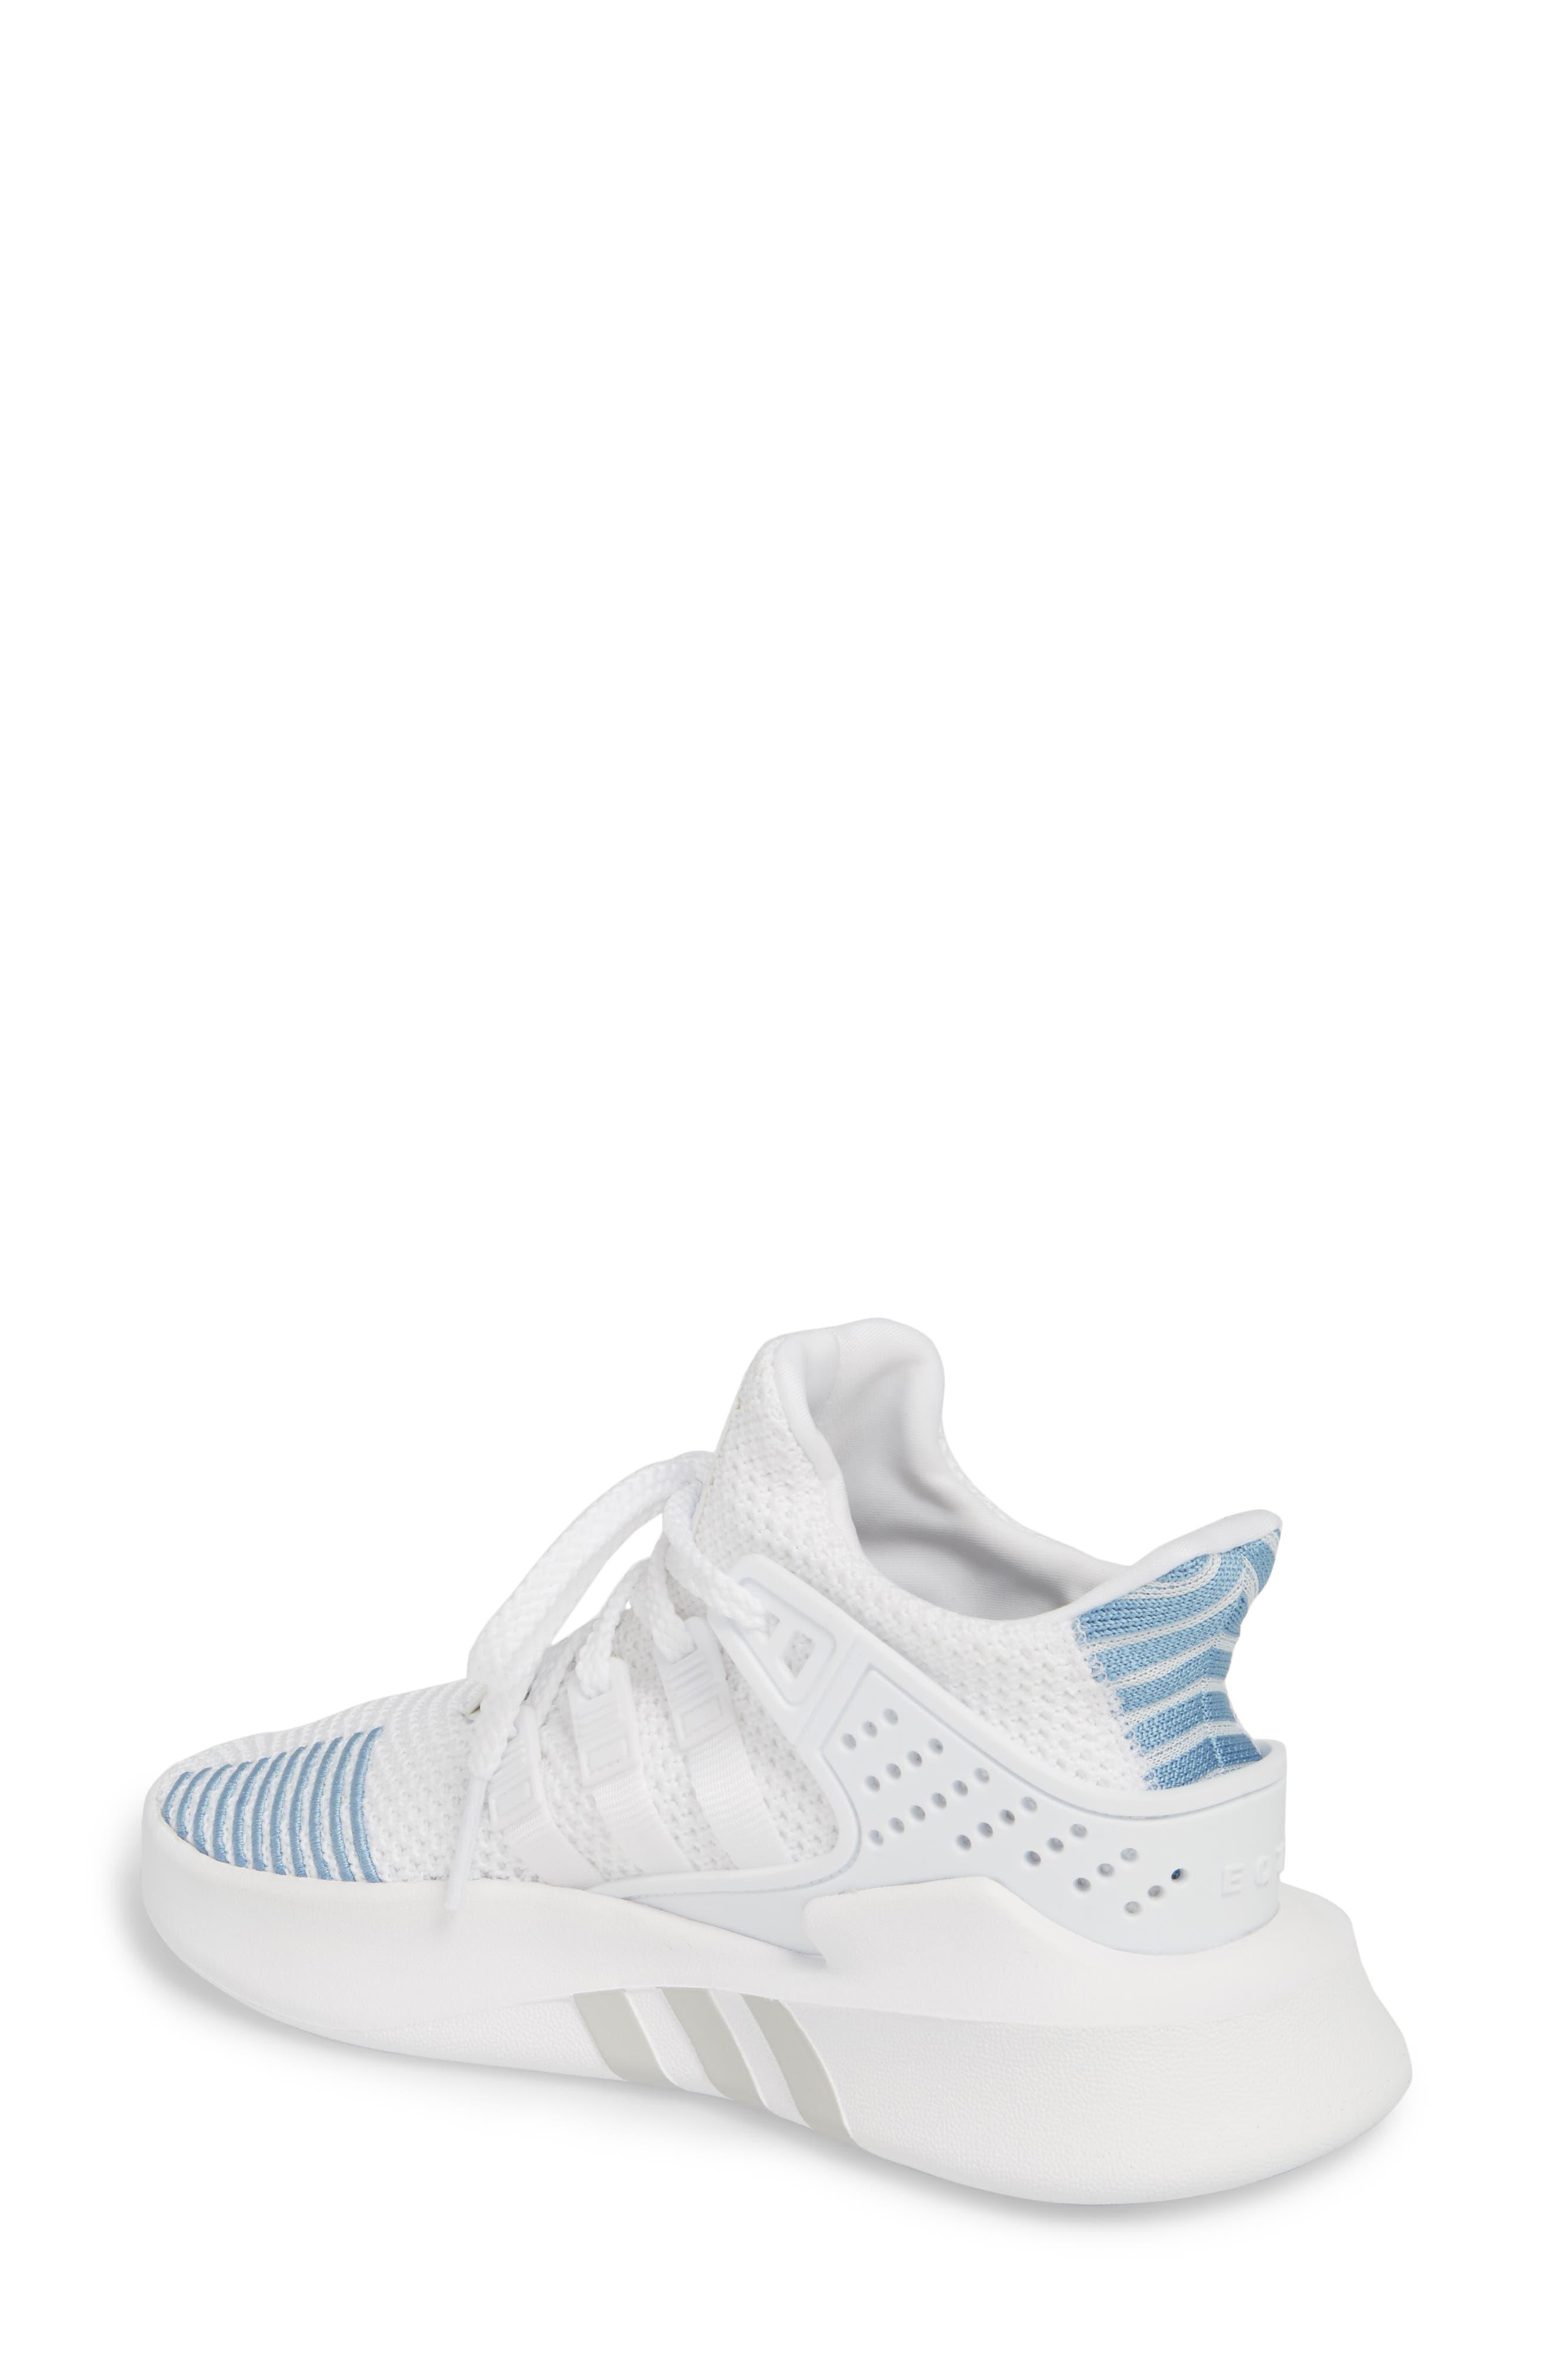 EQT Basketball ADV Sneaker,                             Alternate thumbnail 2, color,                             White/ White/ Ash Blue